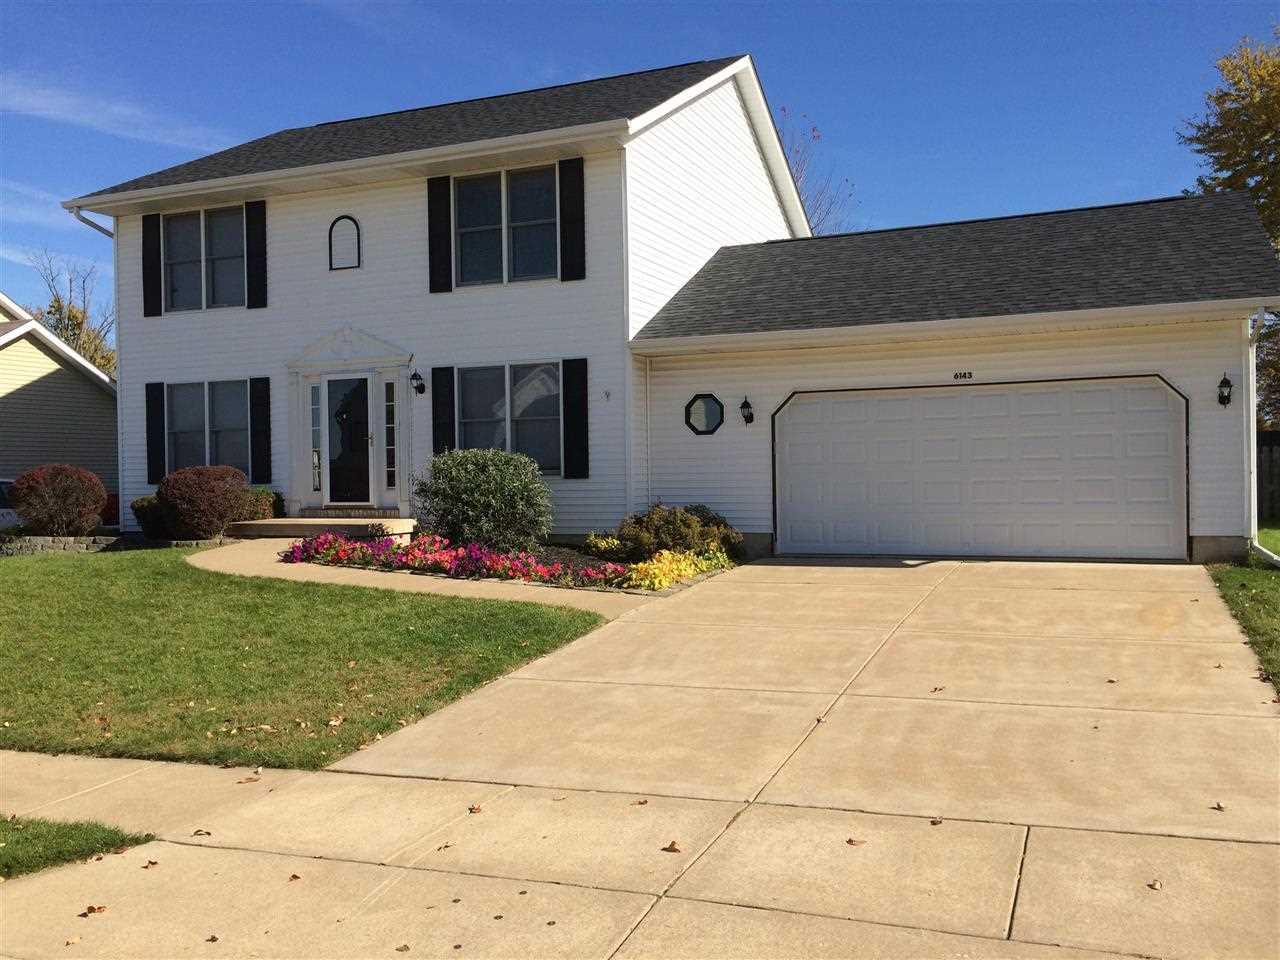 Rental Homes for Rent, ListingId:30457159, location: 6143 LINCOLN Avenue Davenport 52806